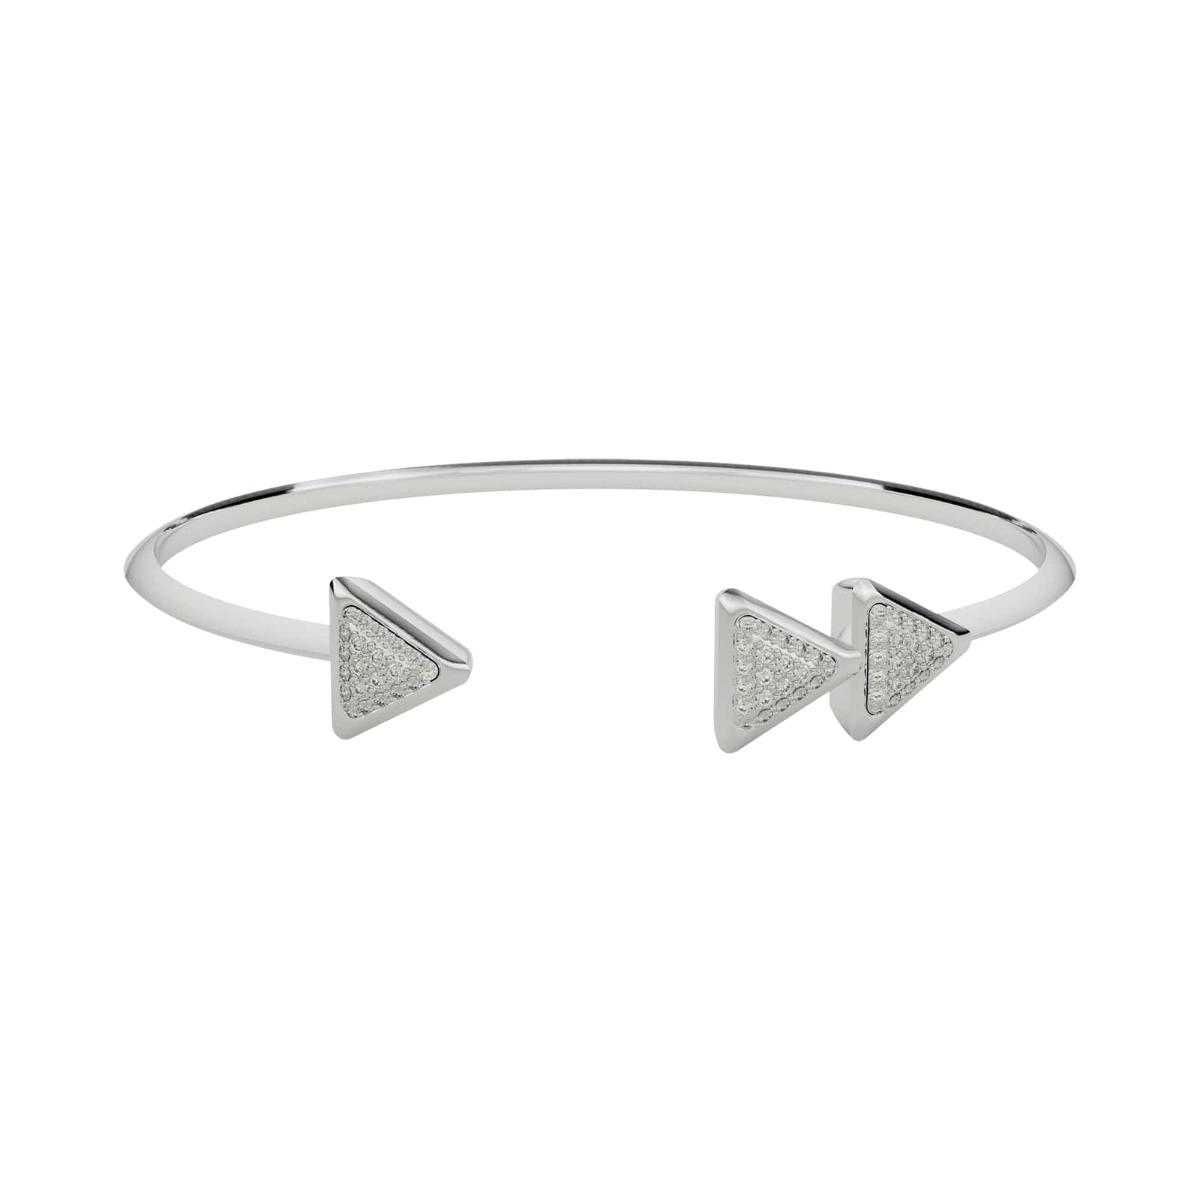 Bracelet Anniversary Dove Vai Forward White Gold Full Diamonds Pavé